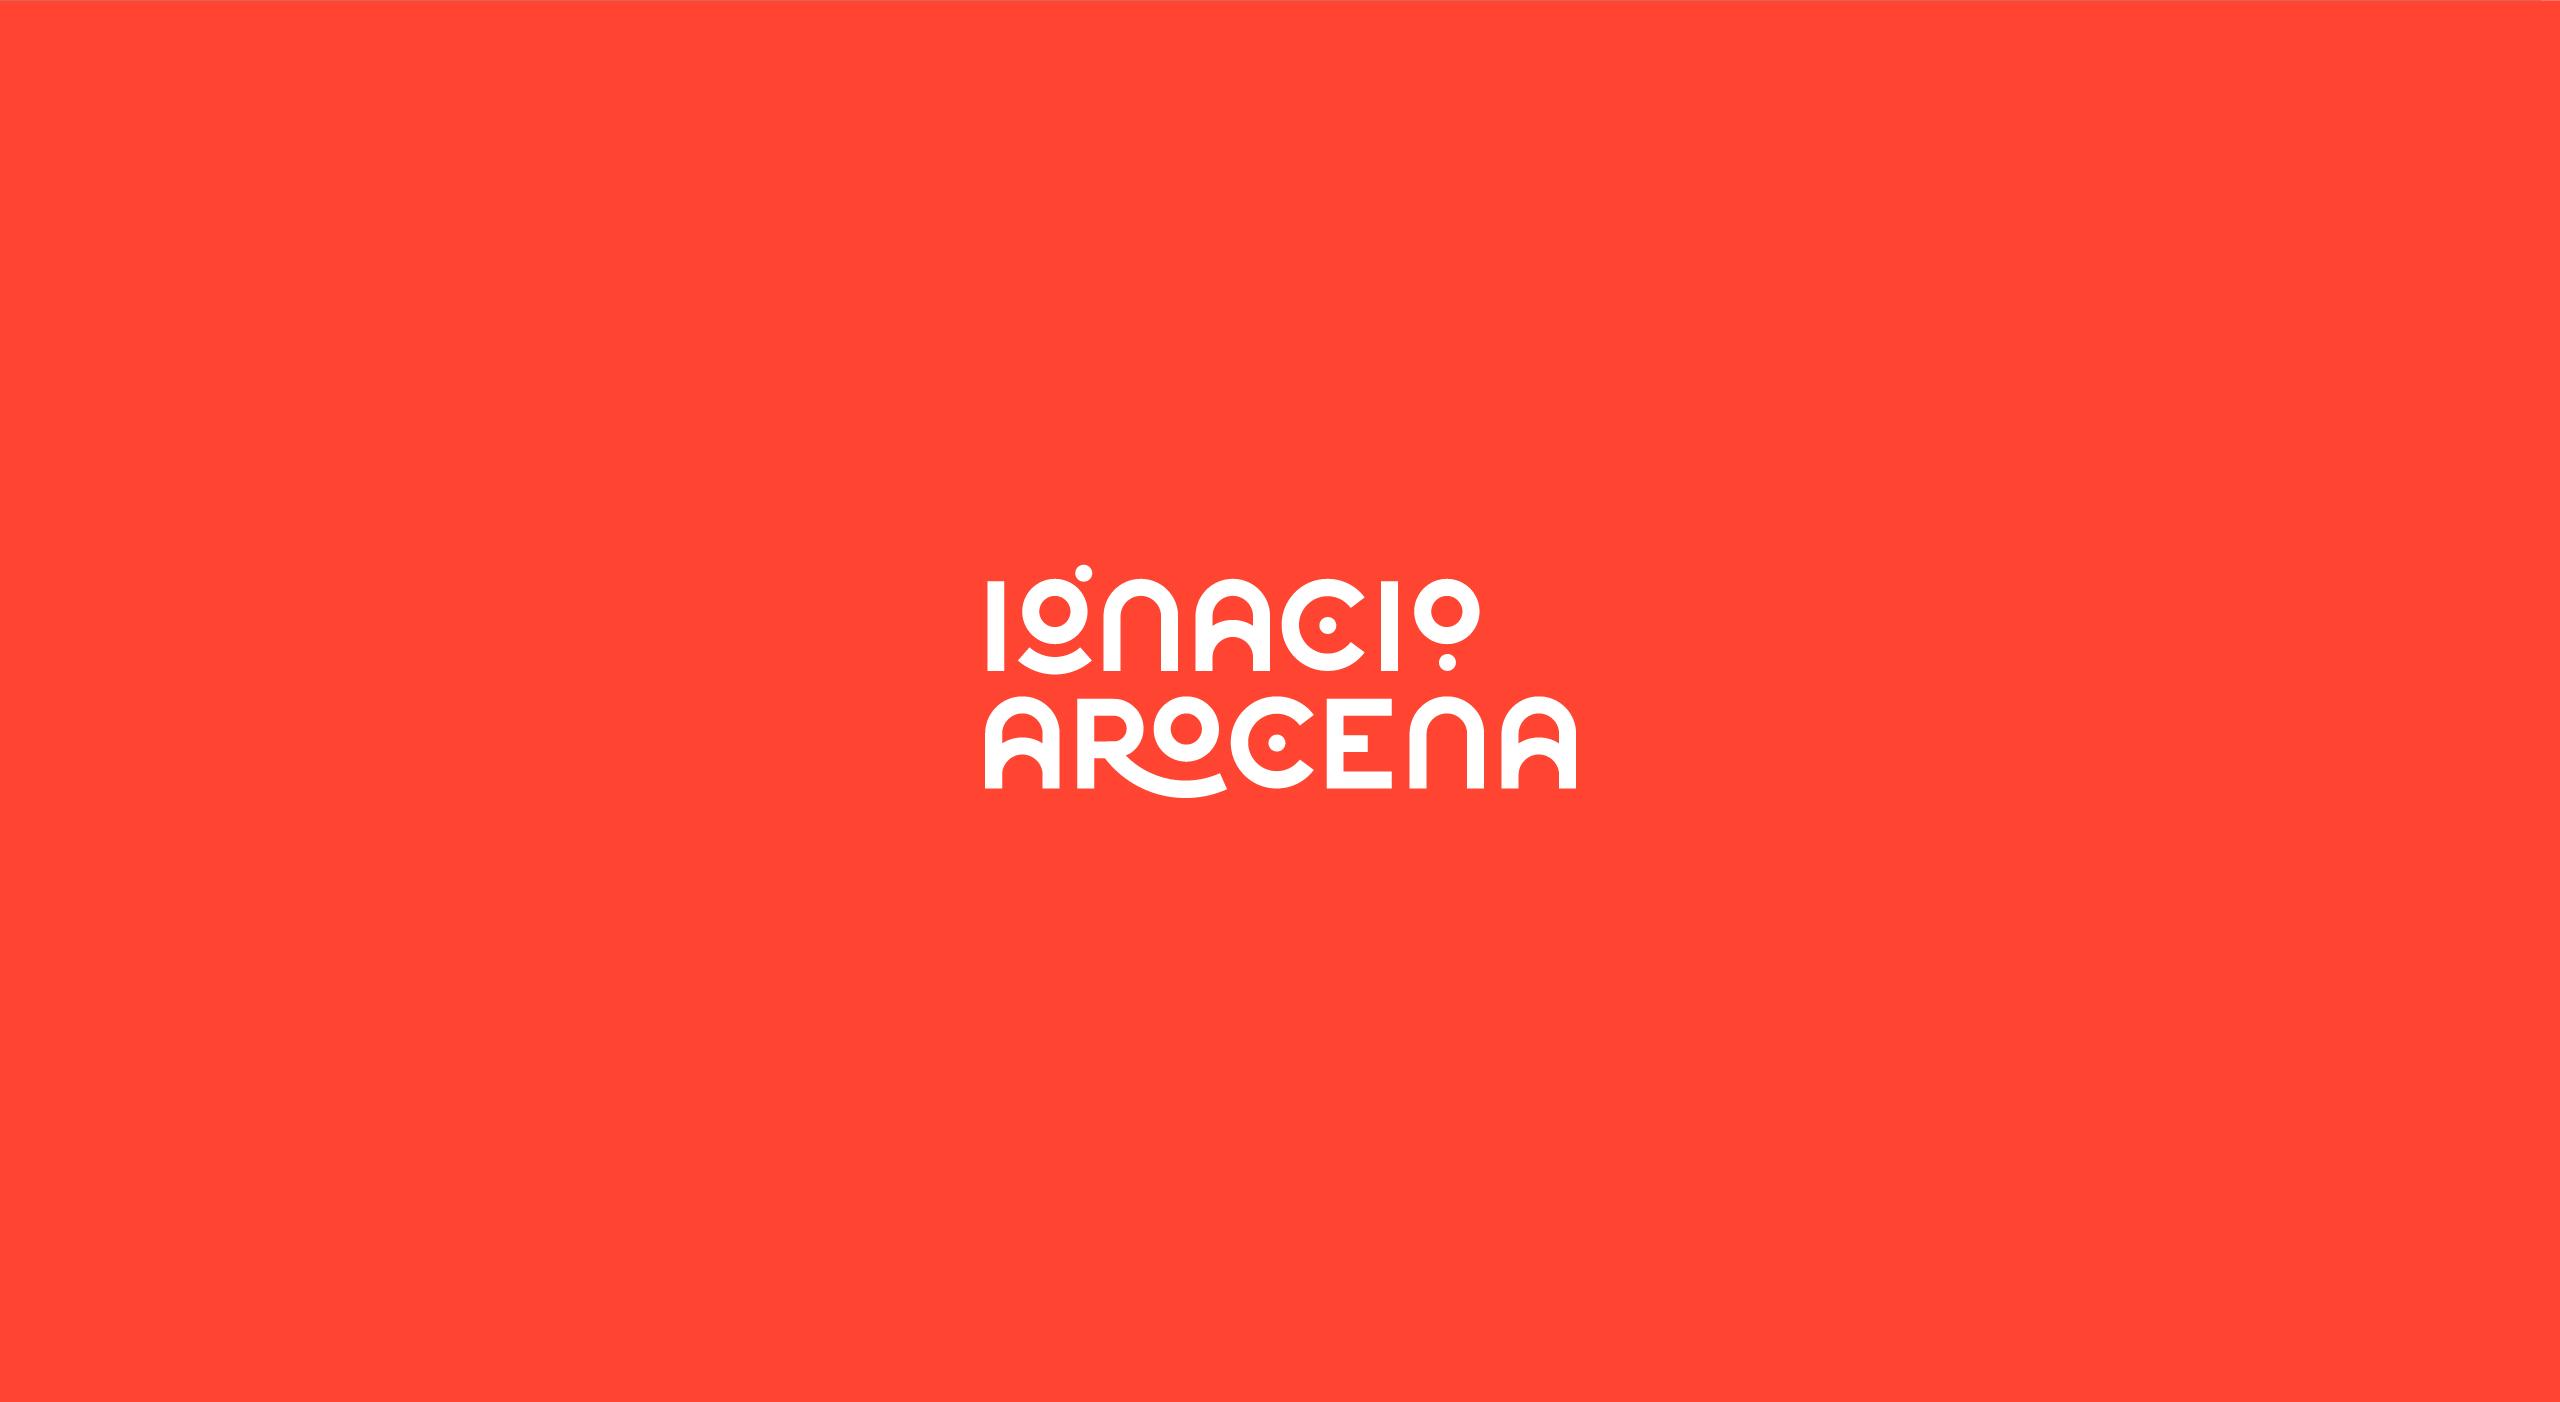 Ignacio-Arocena-logotipo